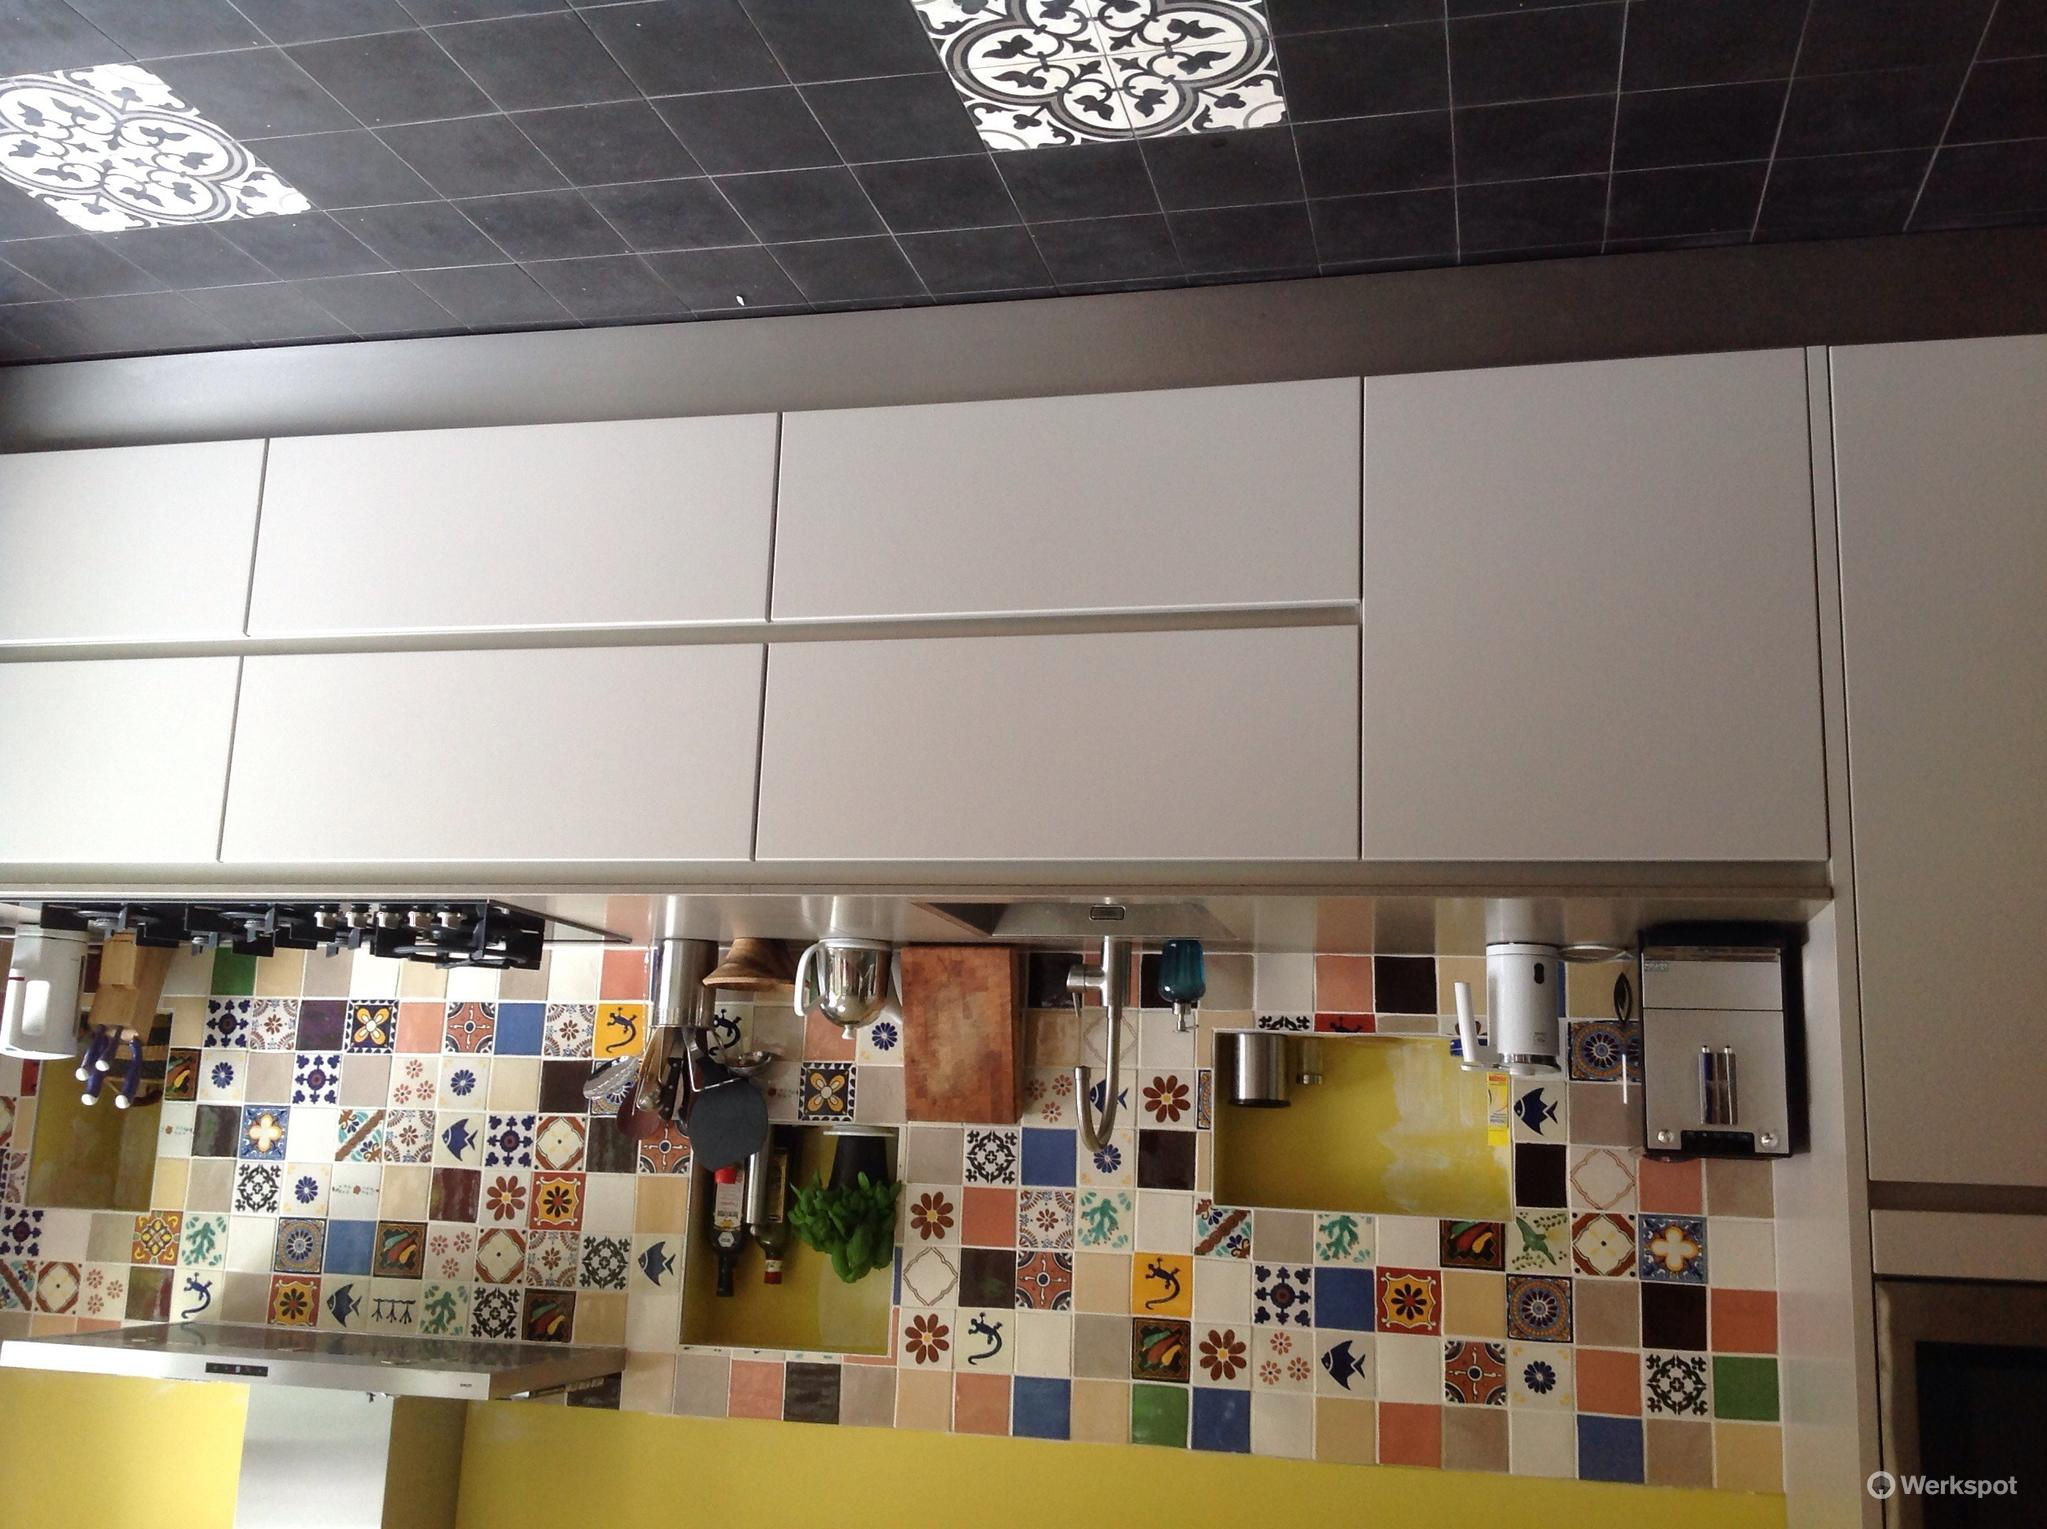 Portugese Vloertegels Keuken : Hangemaakte mexicaanse tegels zetten in keuken en portugese vloer